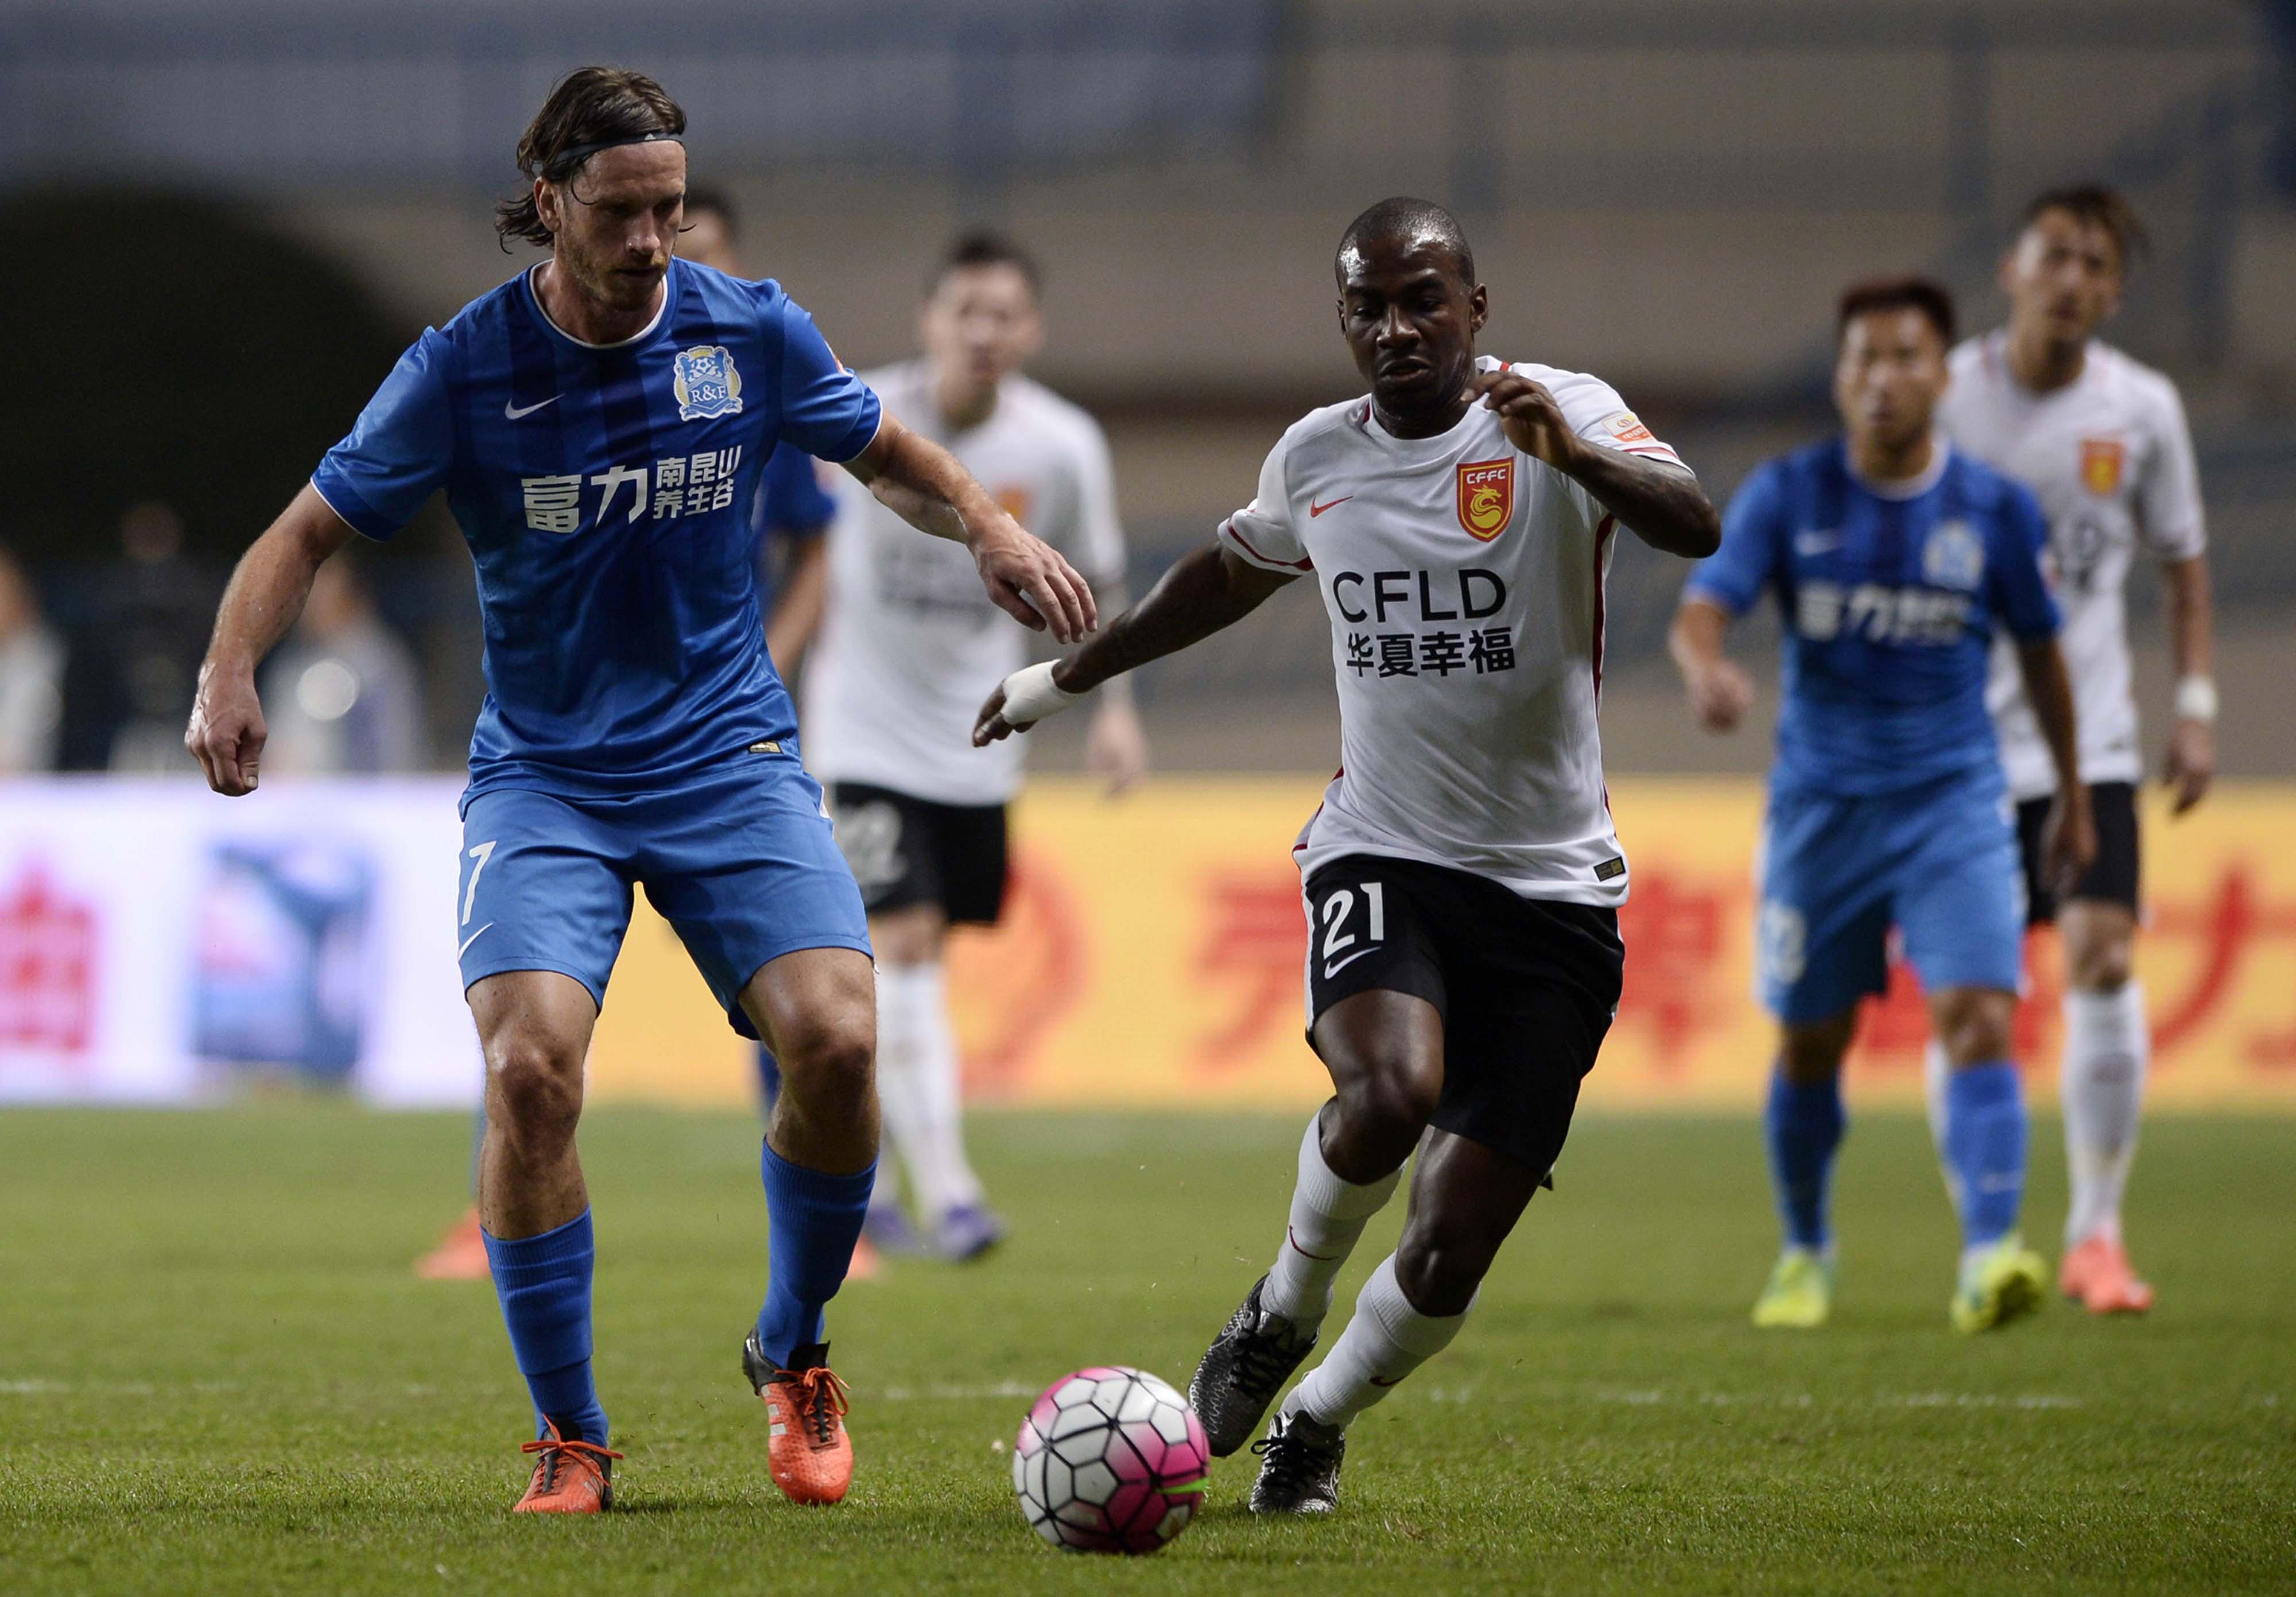 Former Chelsea winger Gael Kakuta joins Deportivo La Coruna after Chinese Super League rule change